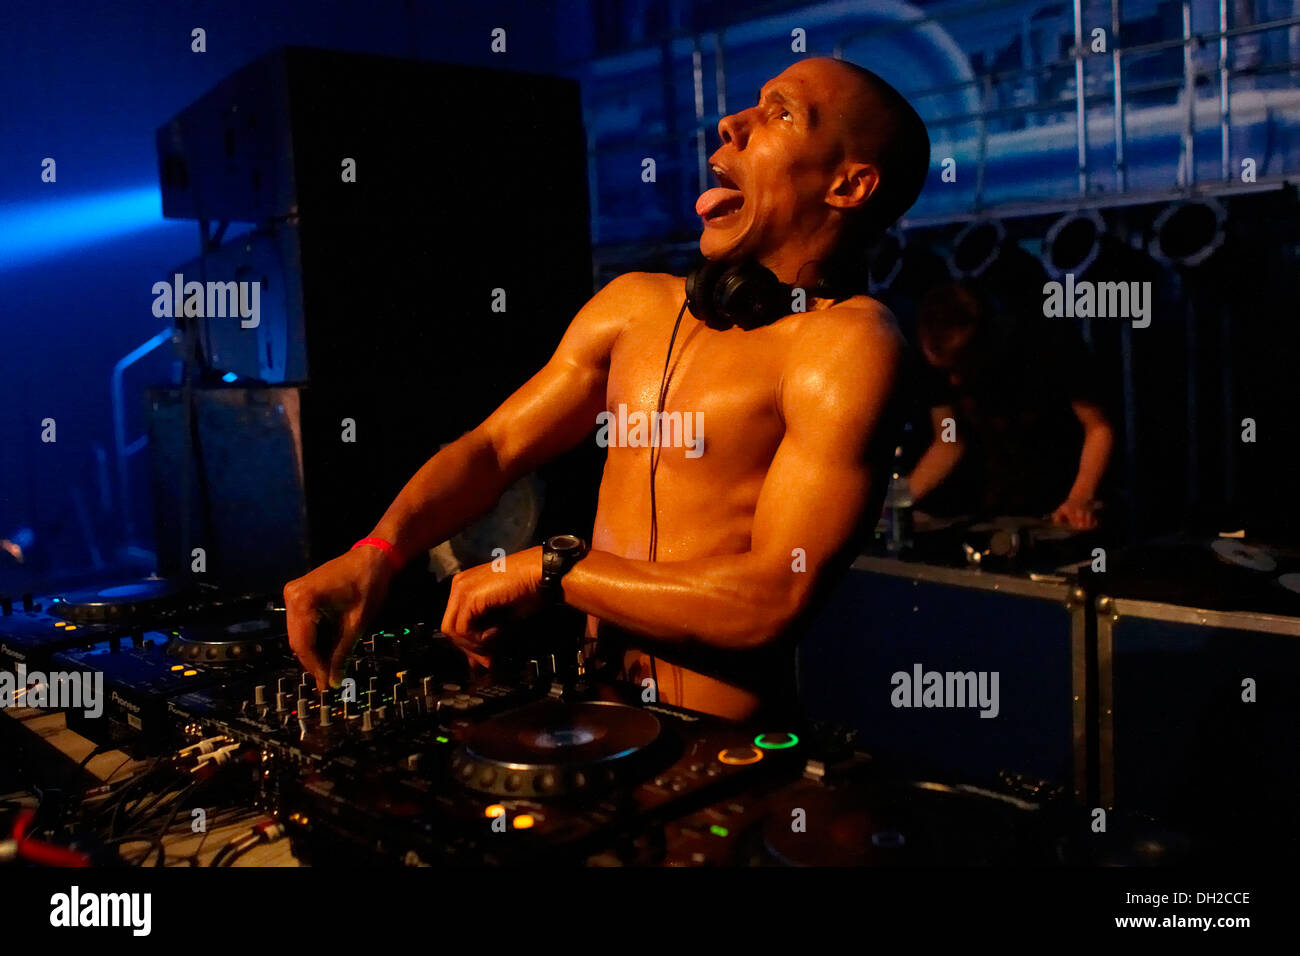 DJ Showtek, techno festival Mayday 2010 nel Westfalenhalle concert hall, Dortmund, Renania settentrionale-Vestfalia Immagini Stock